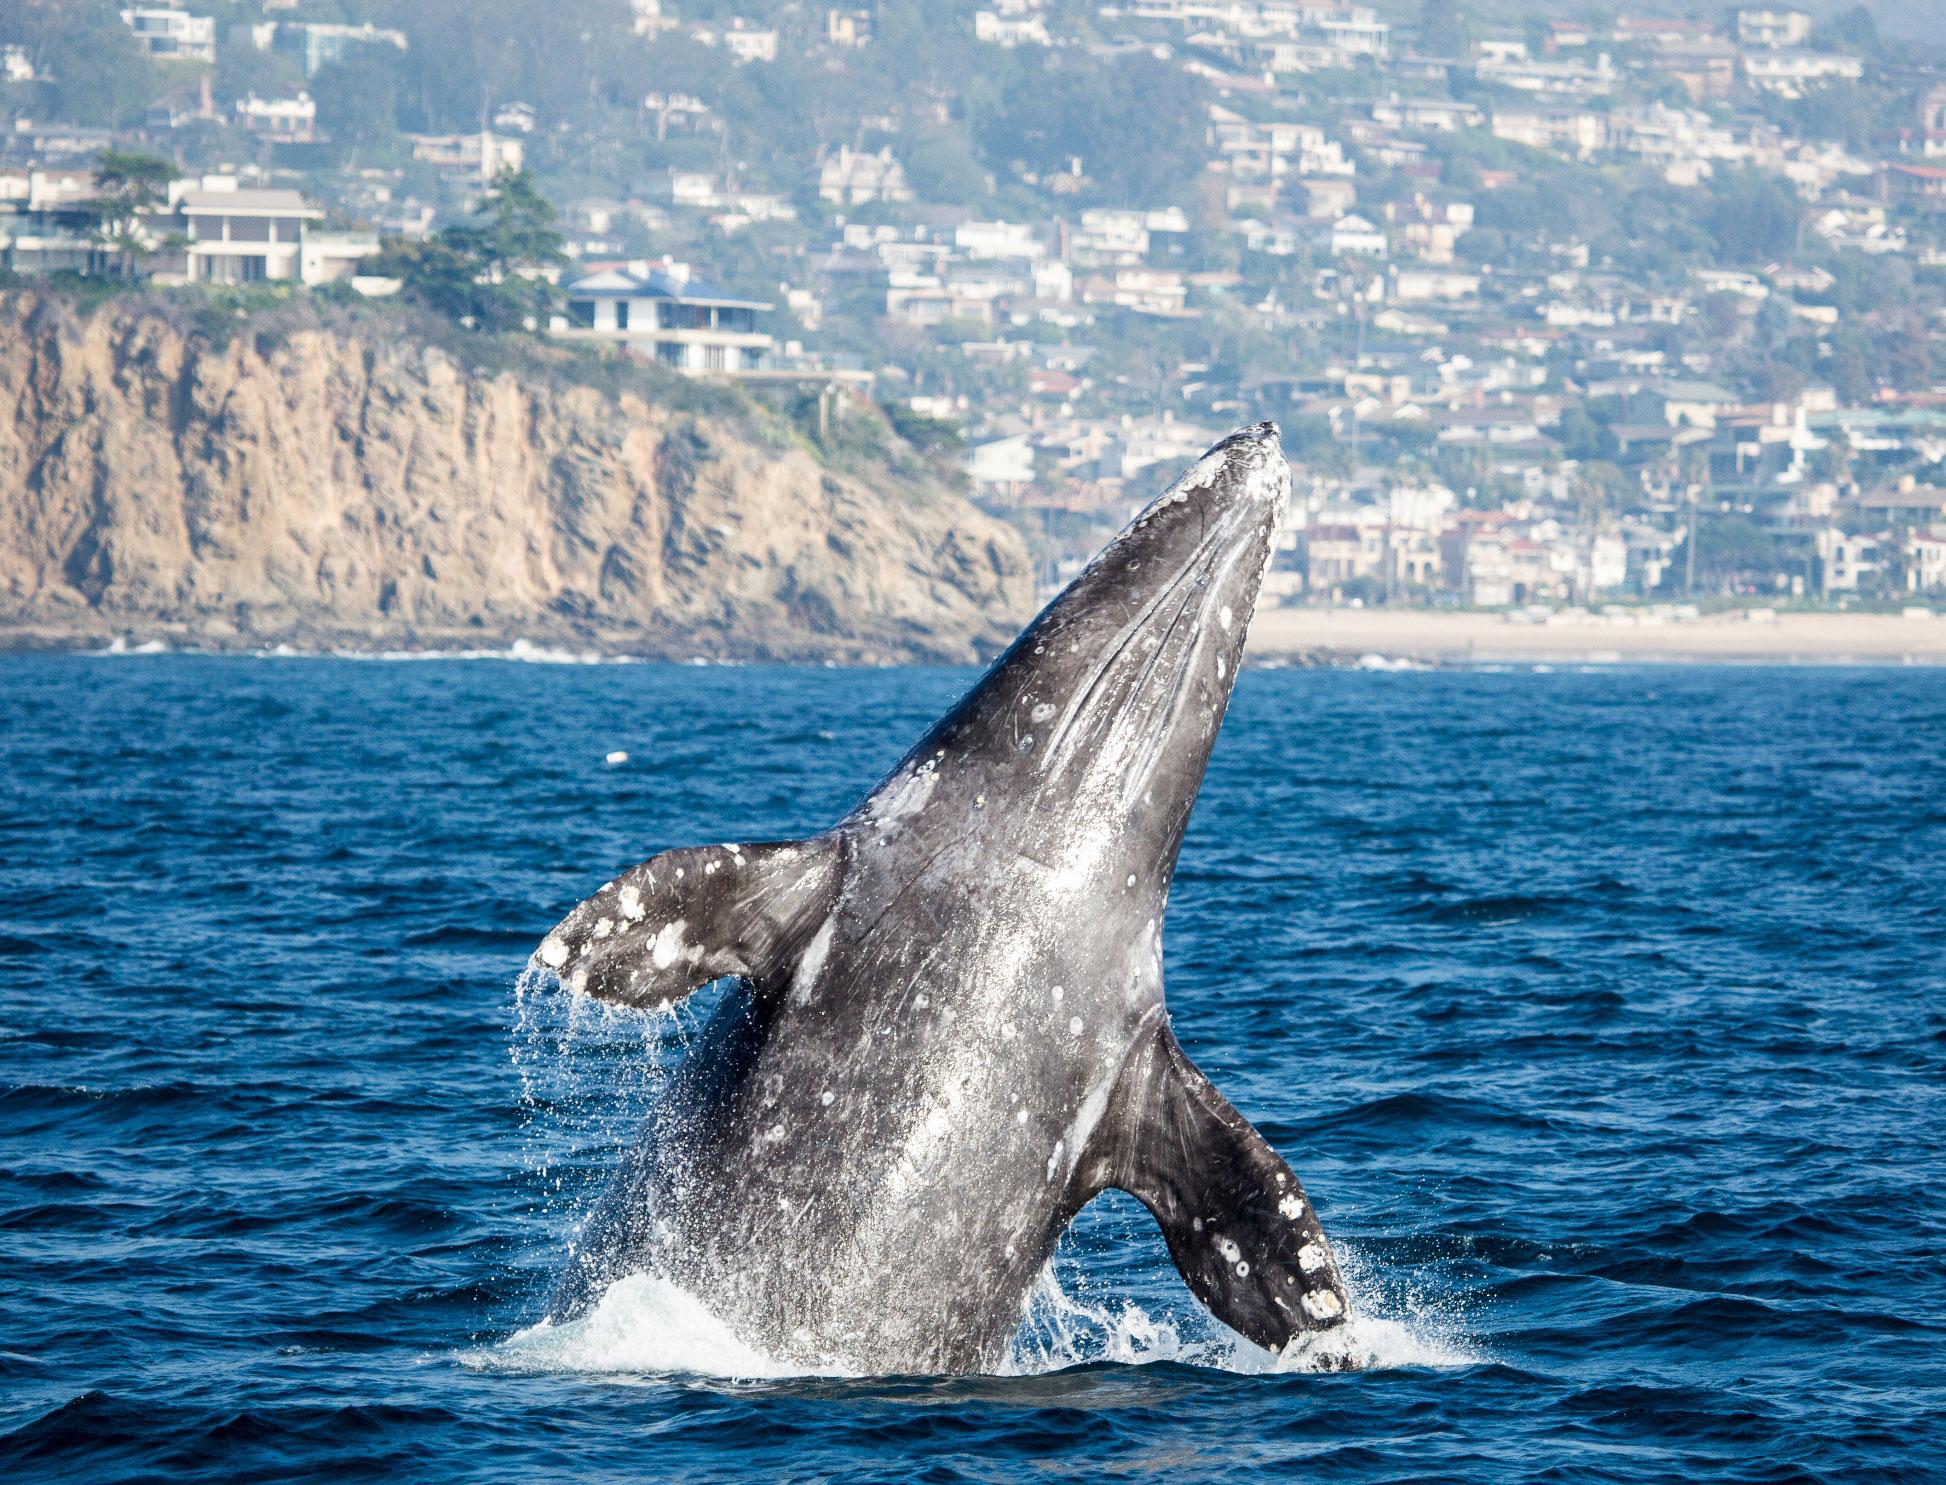 Best Whale Watching Tour In Monterey